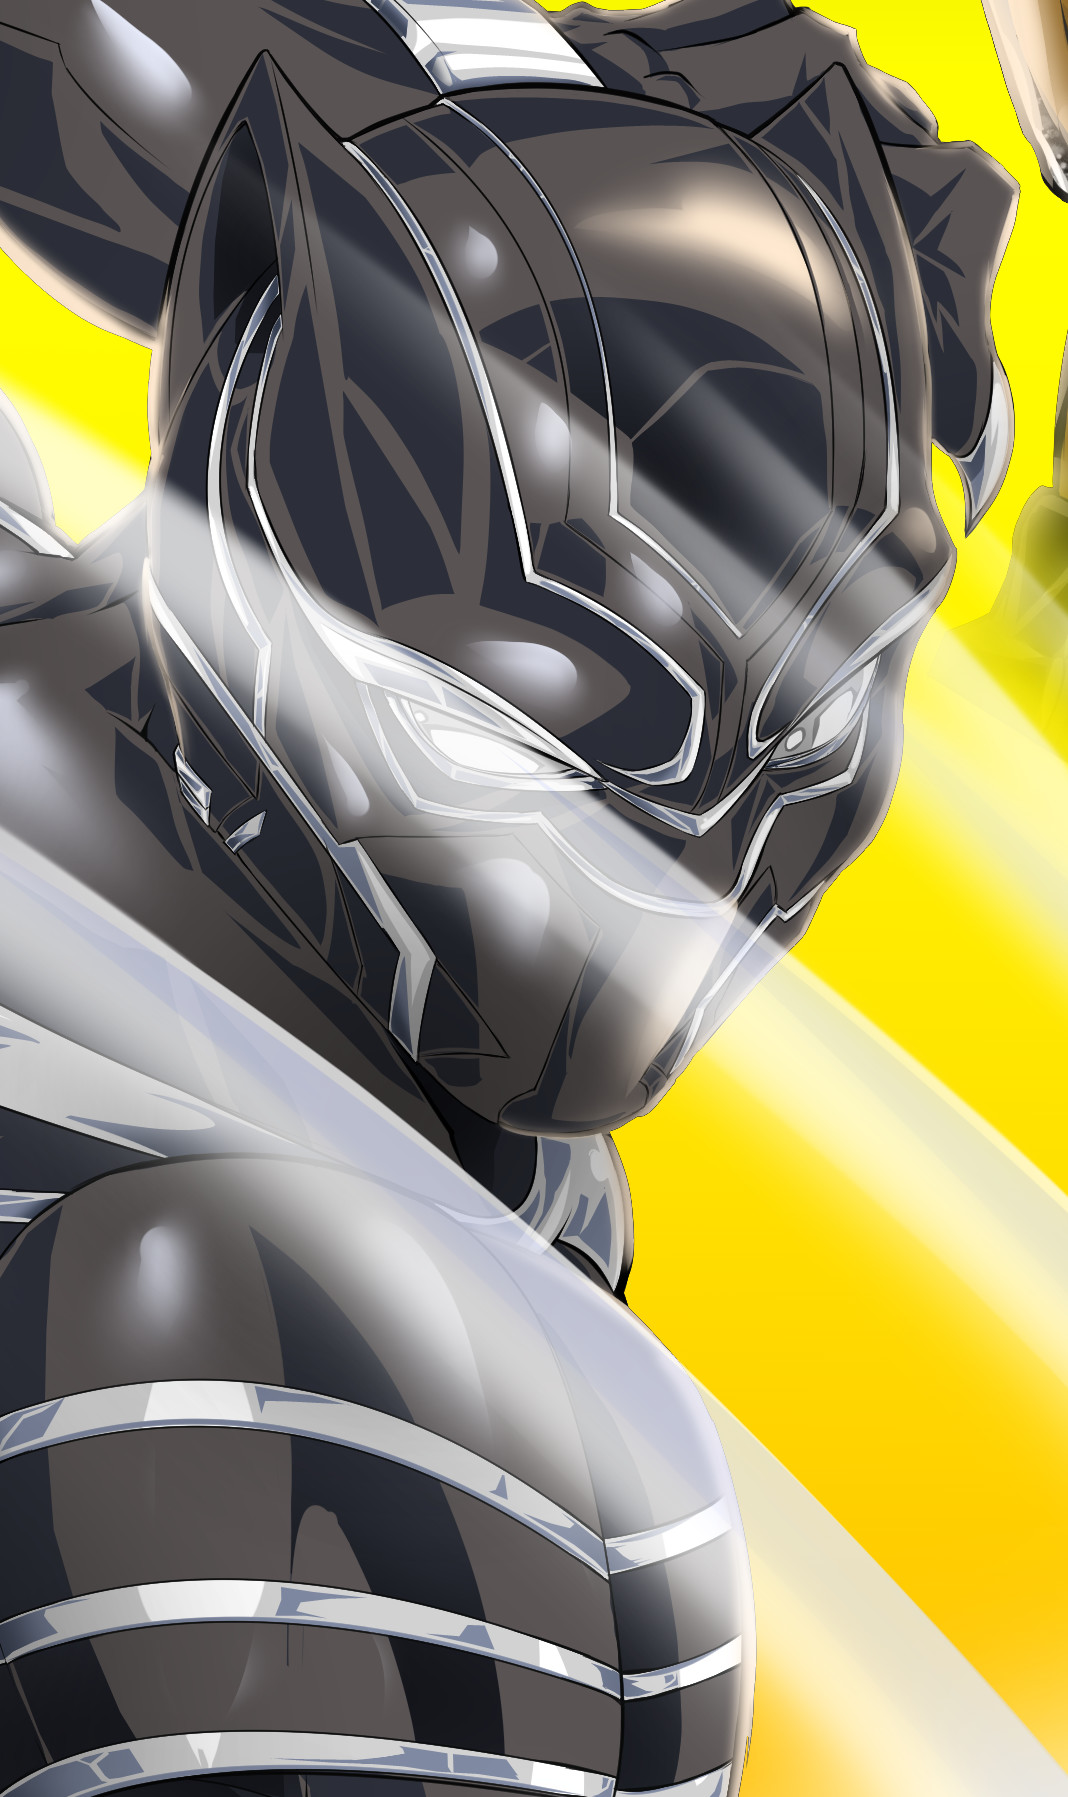 Robert e wilson black panther 2